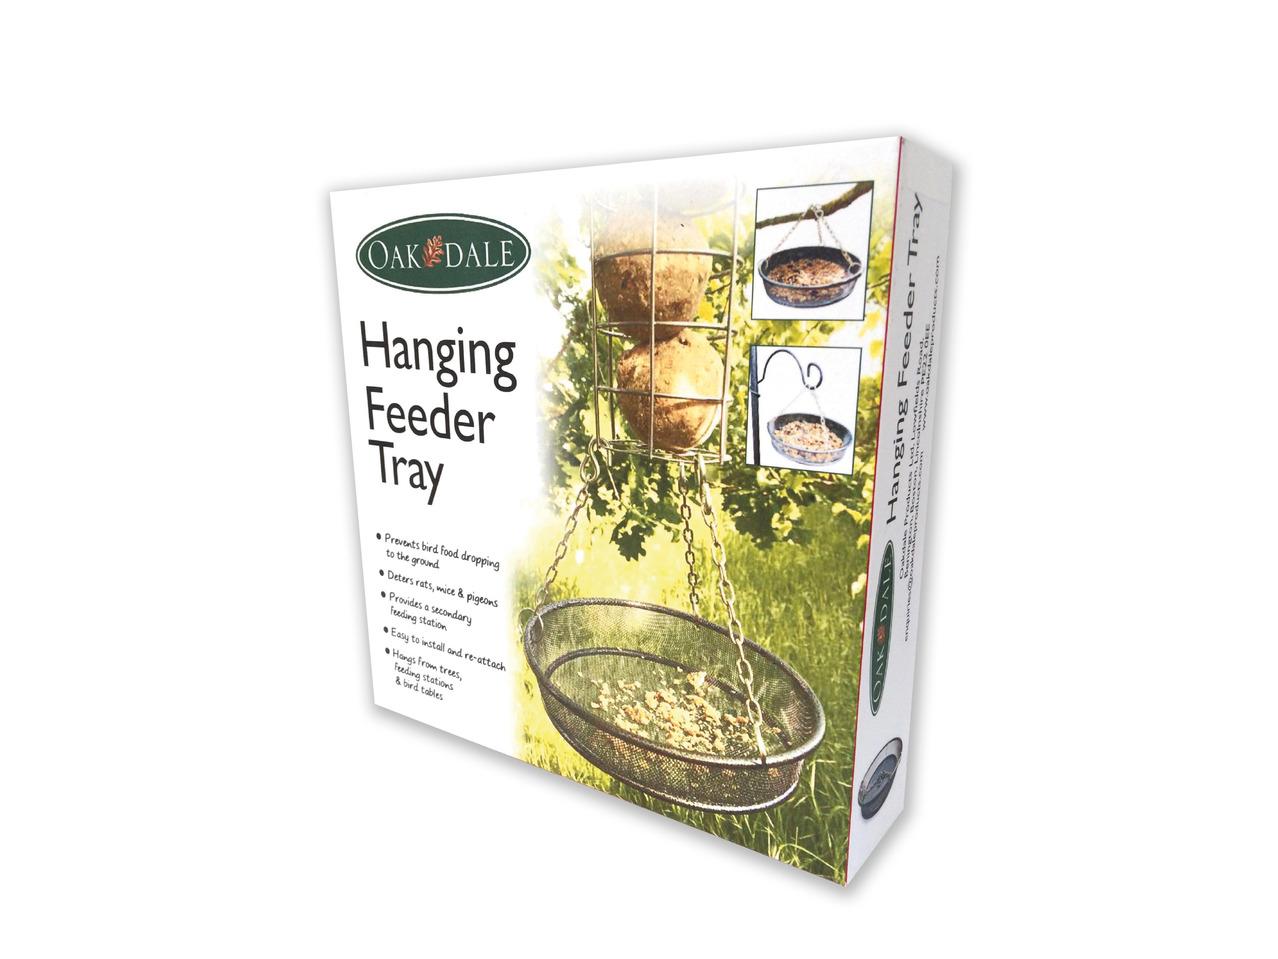 Oakdale Hanging Feeder Tray